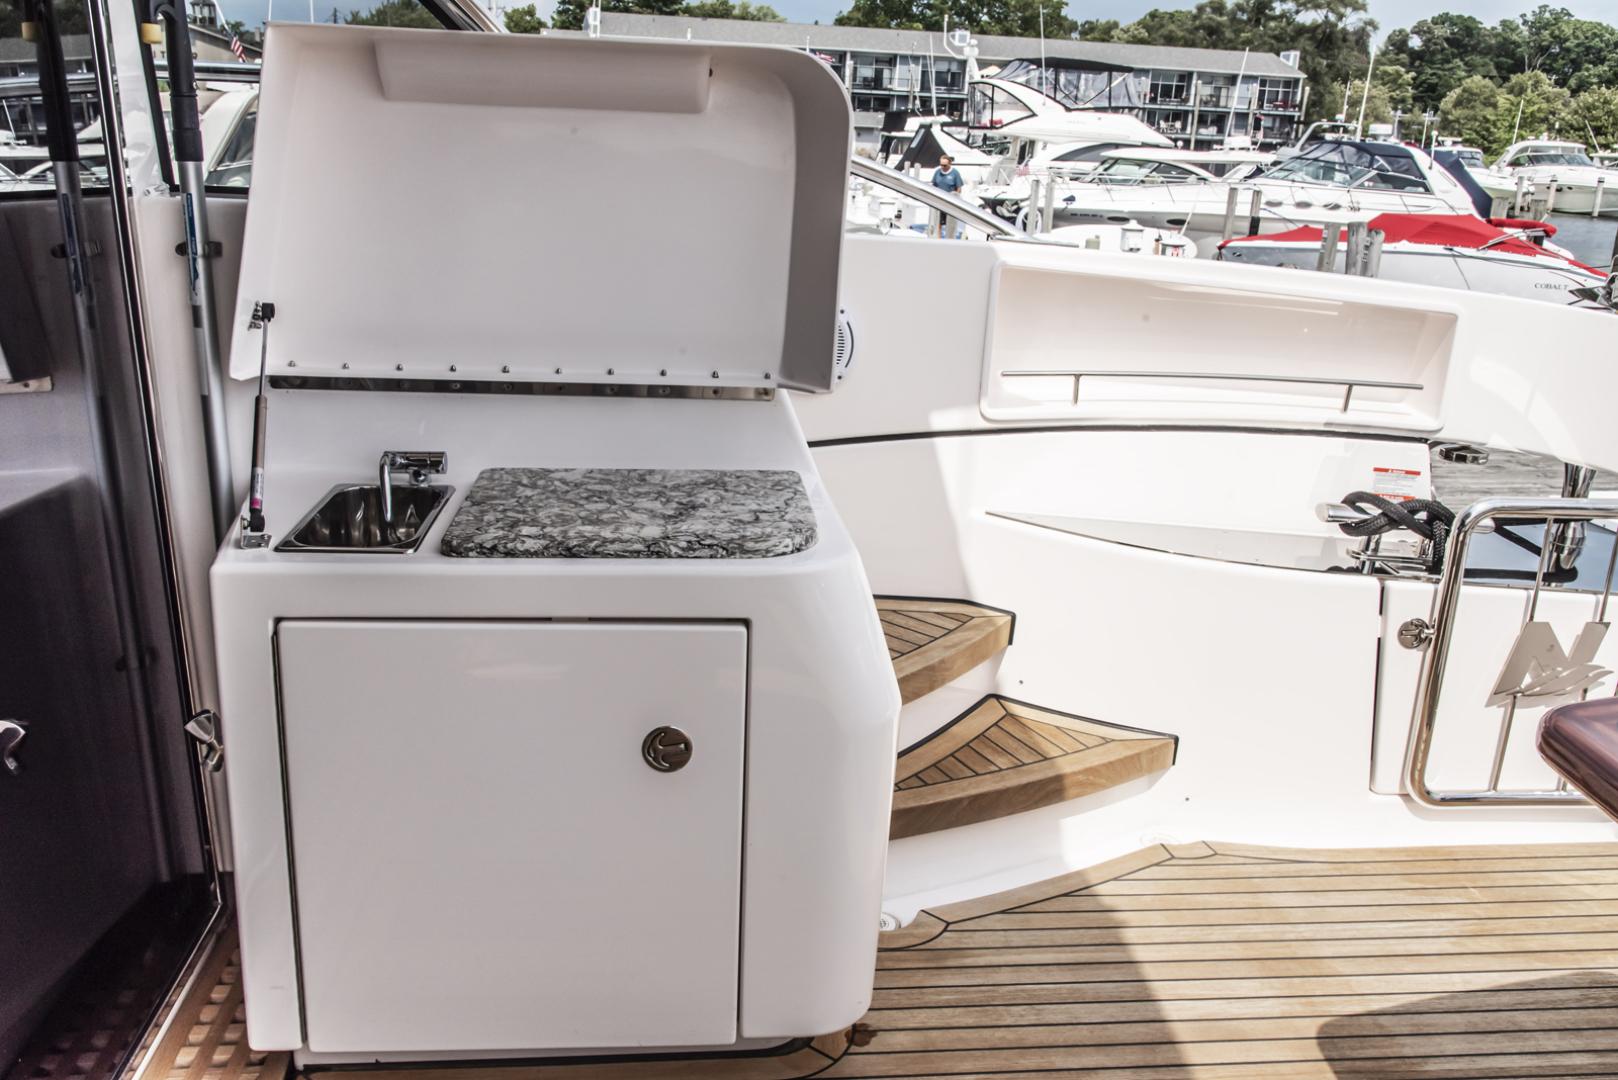 Neptunus-Motor Yacht Express 2018-LIQUID WISDOM Grand Haven-Michigan-United States-Aft deck sink-1485008 | Thumbnail